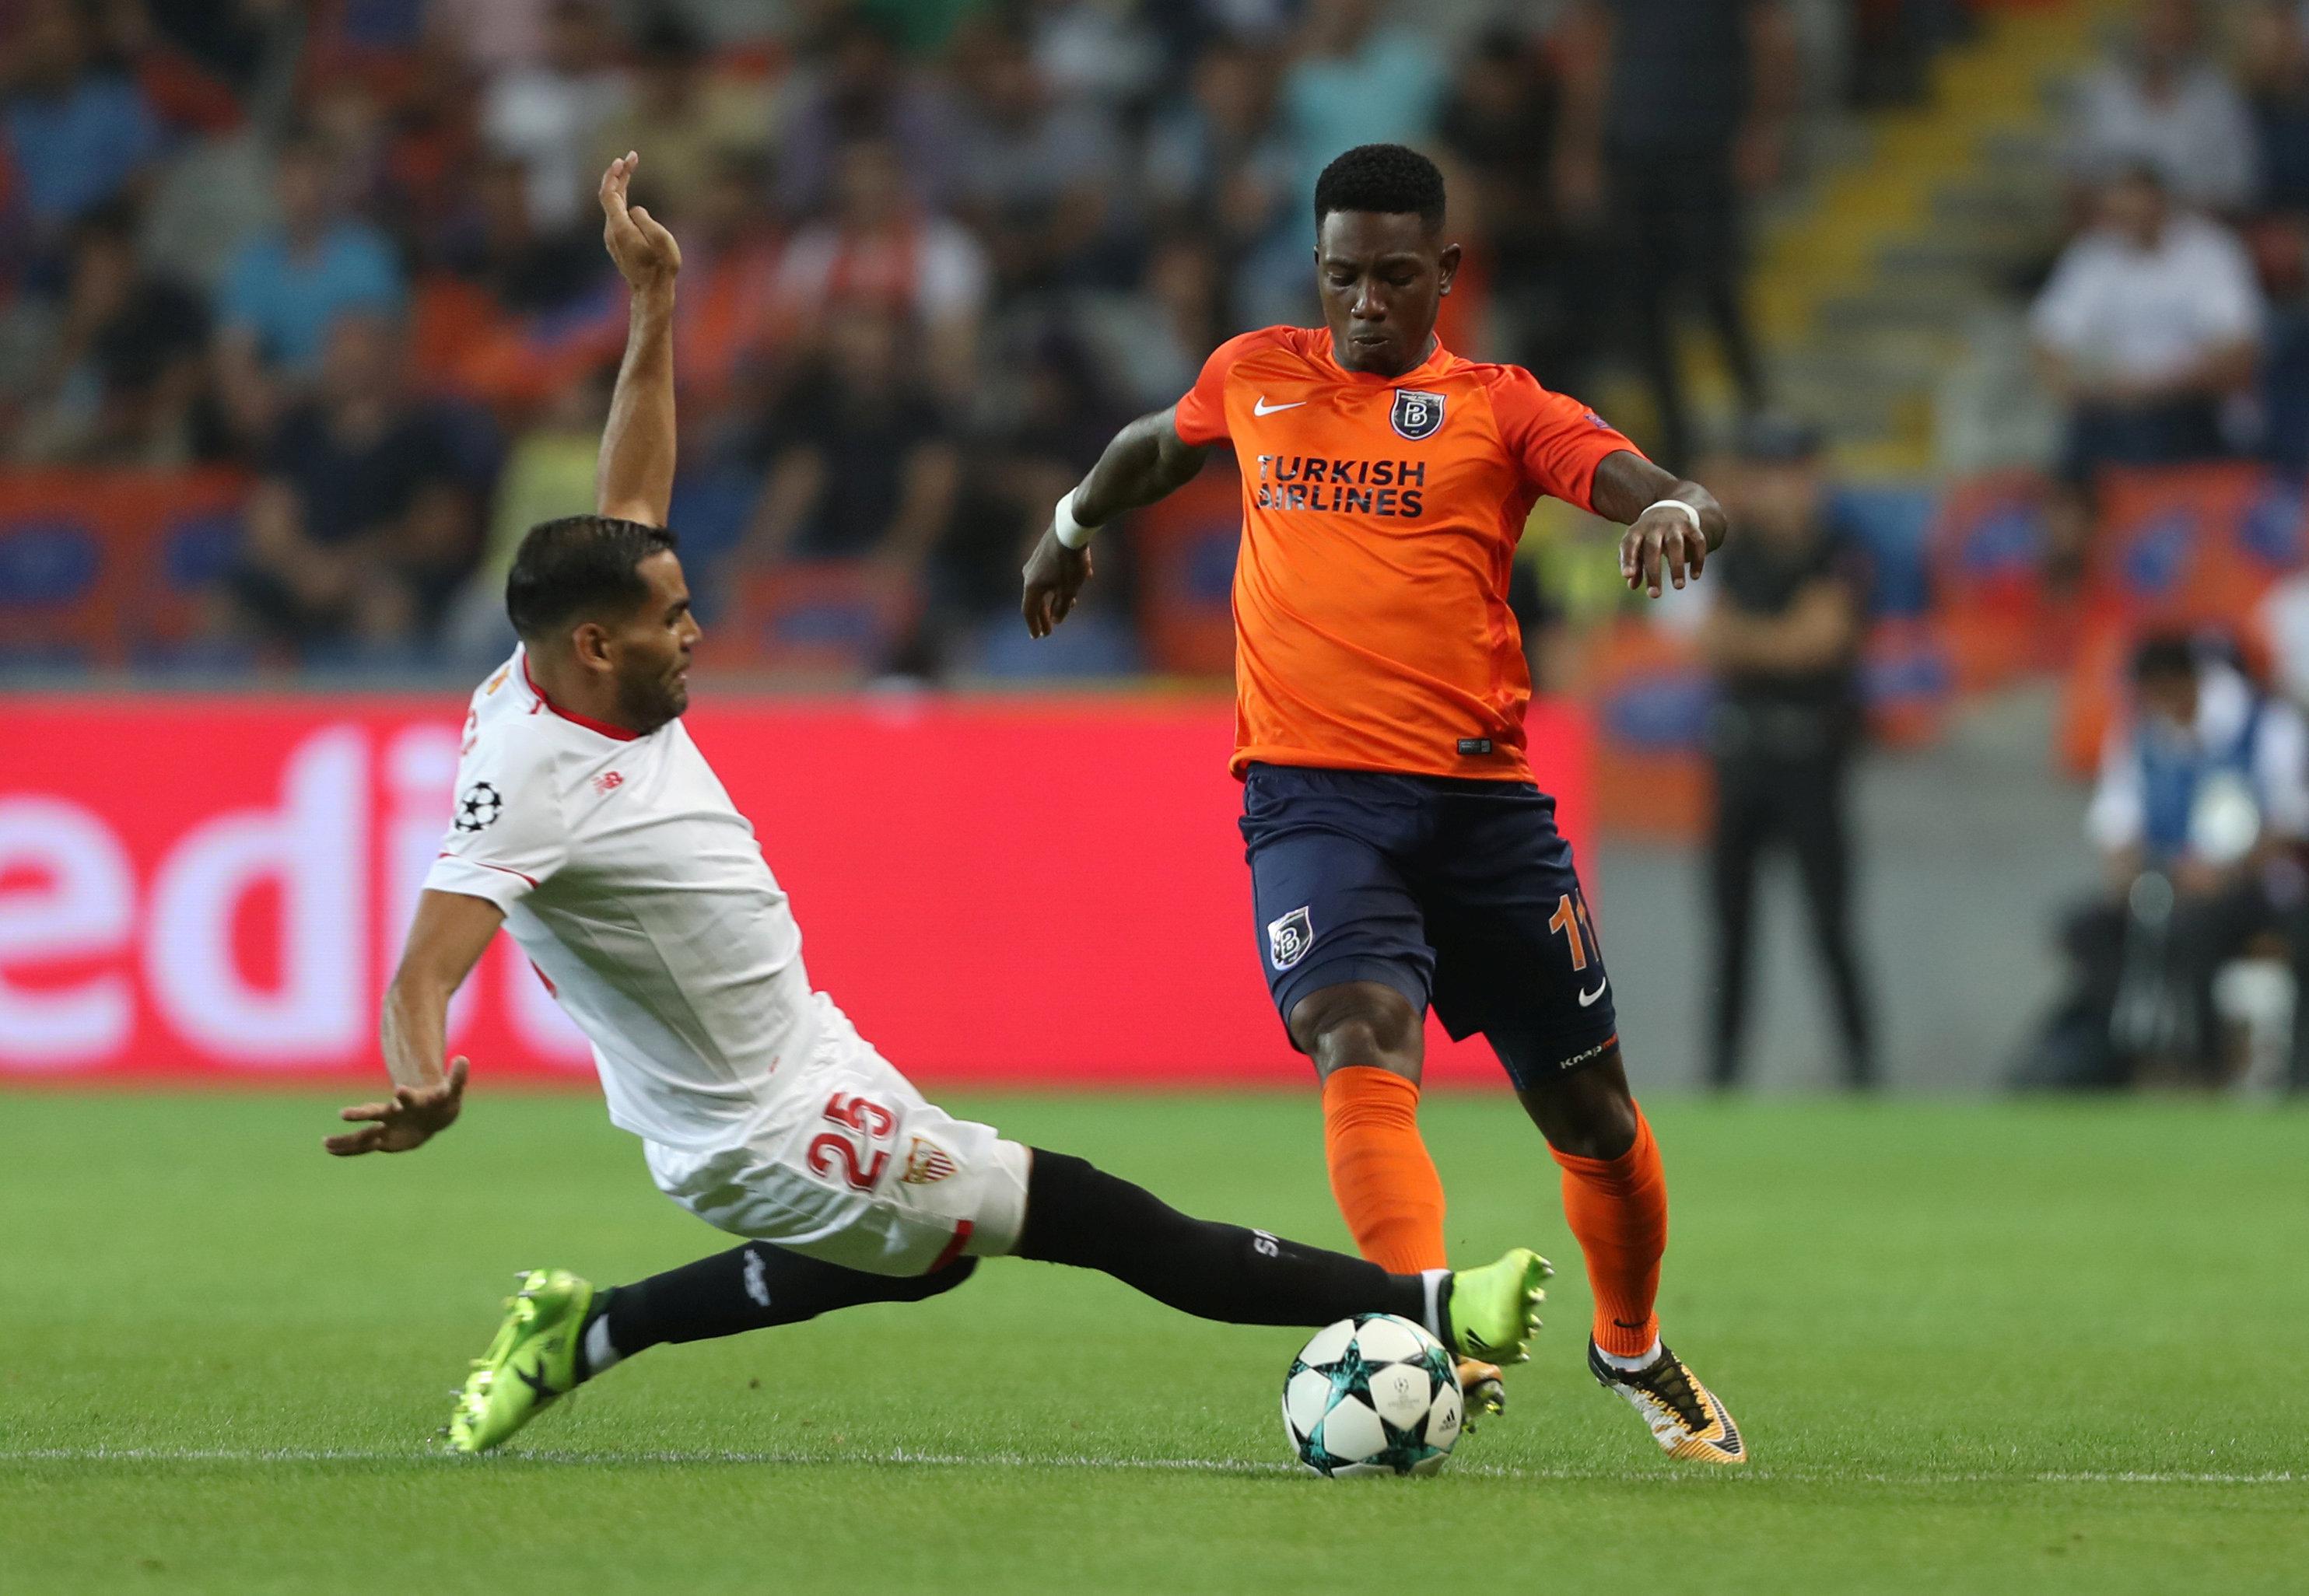 Scorende Elia trots op Basaksehir ondanks nederlaag tegen Sevilla